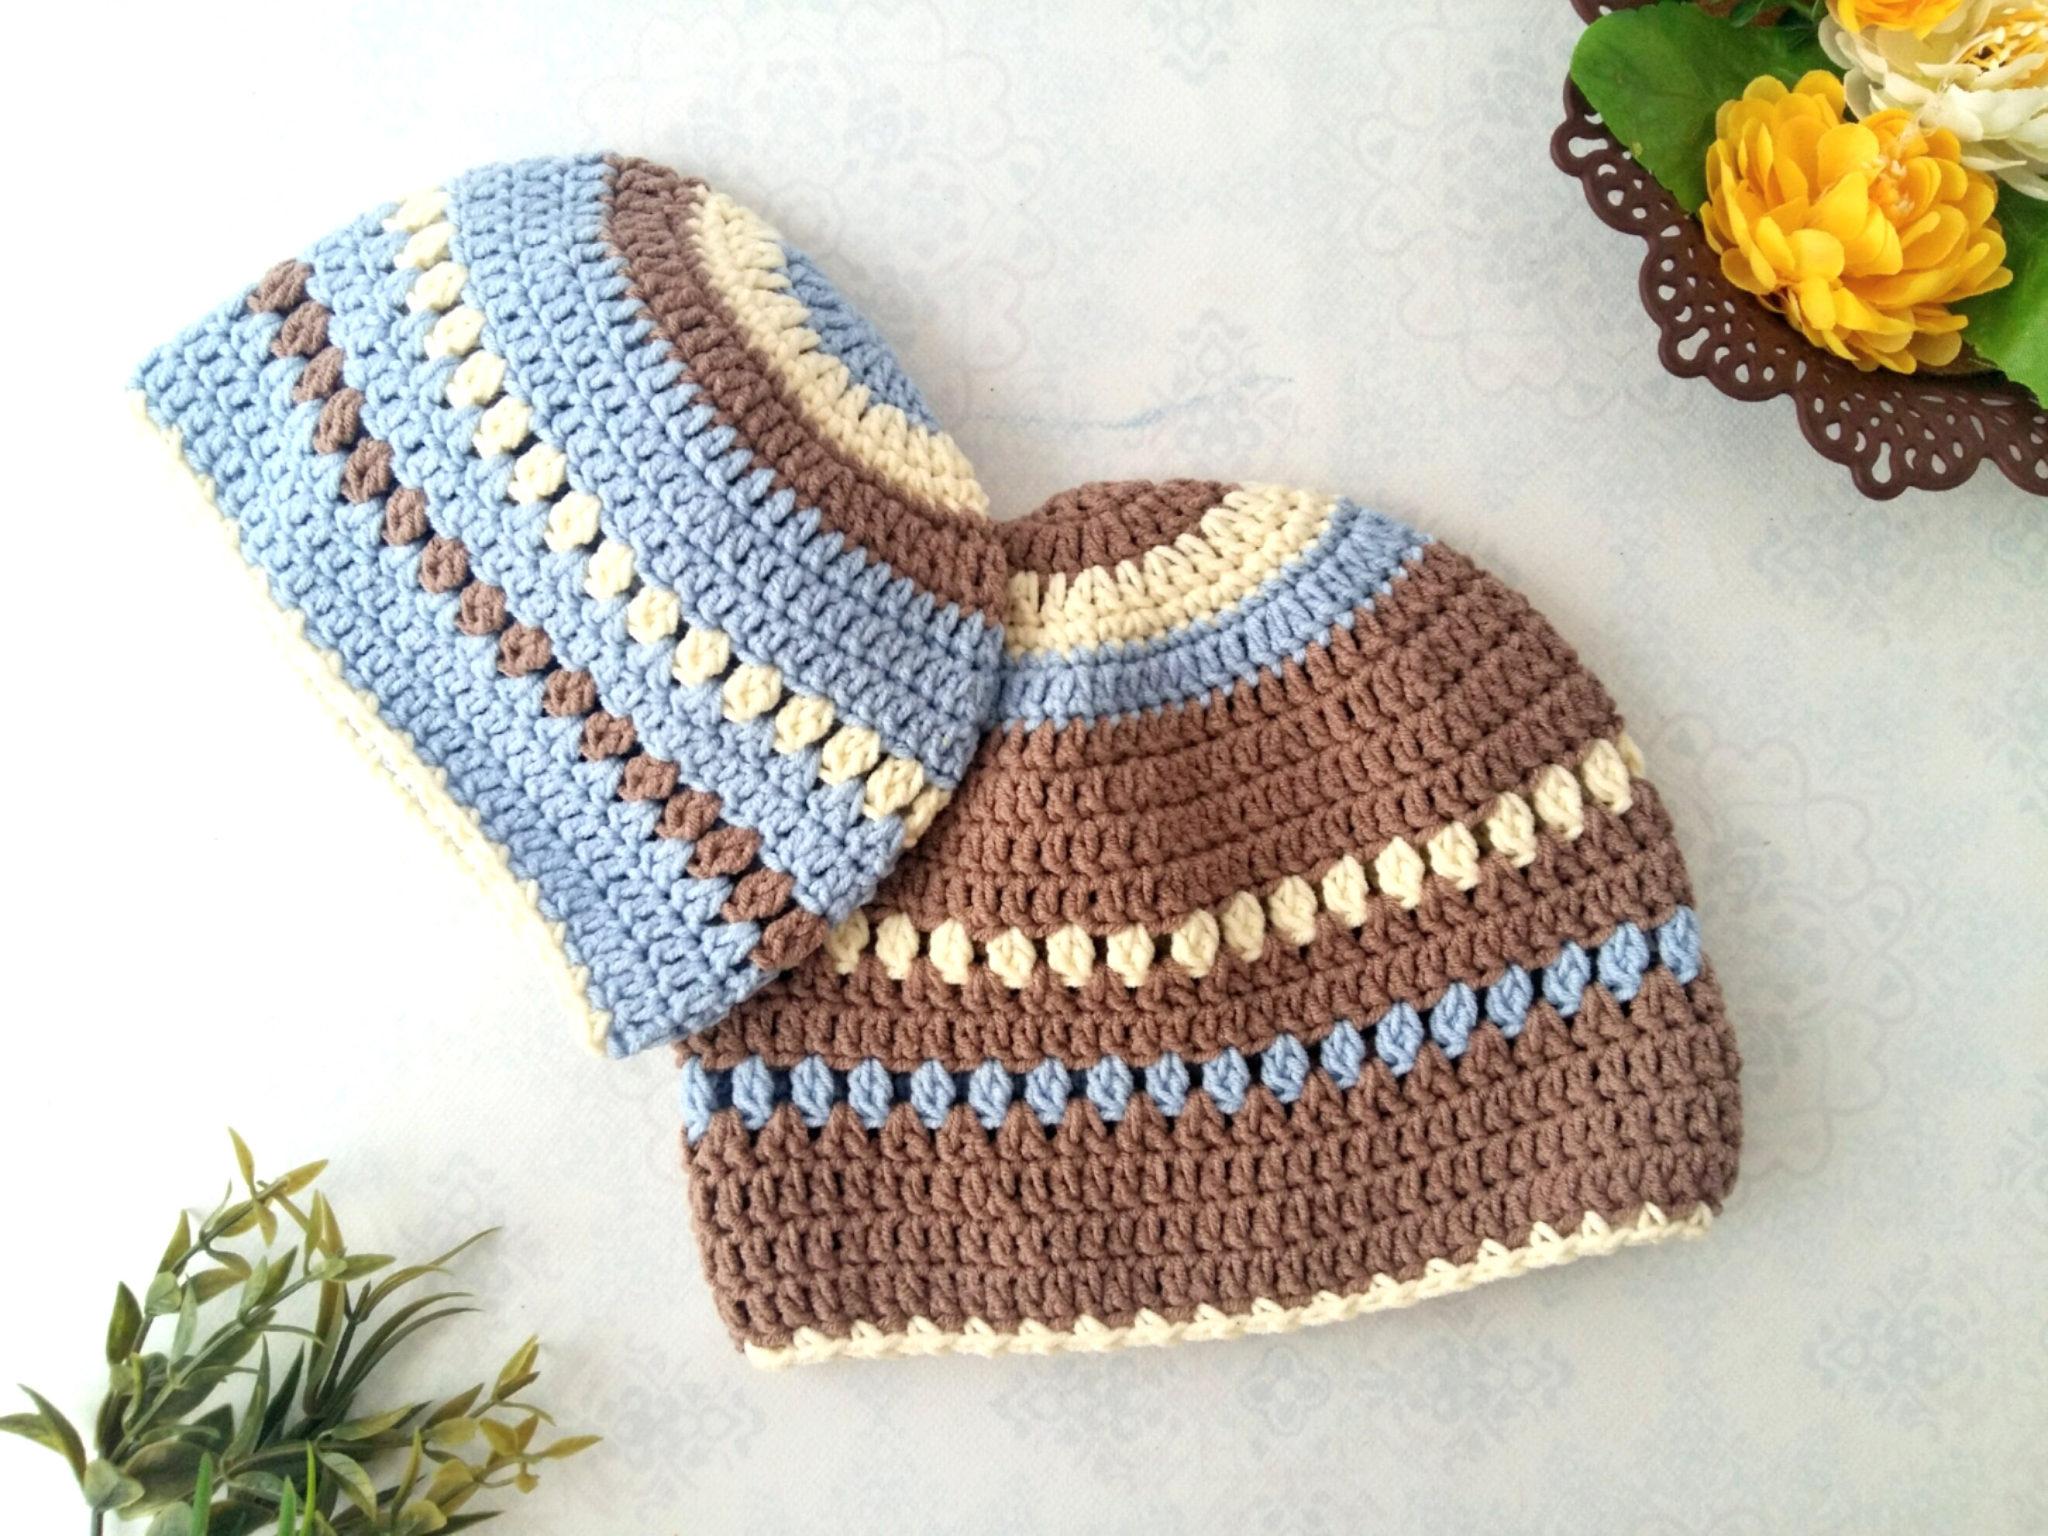 The Creamy Crochet Baby Beanie | Free crochet pattern - My Accessory Box